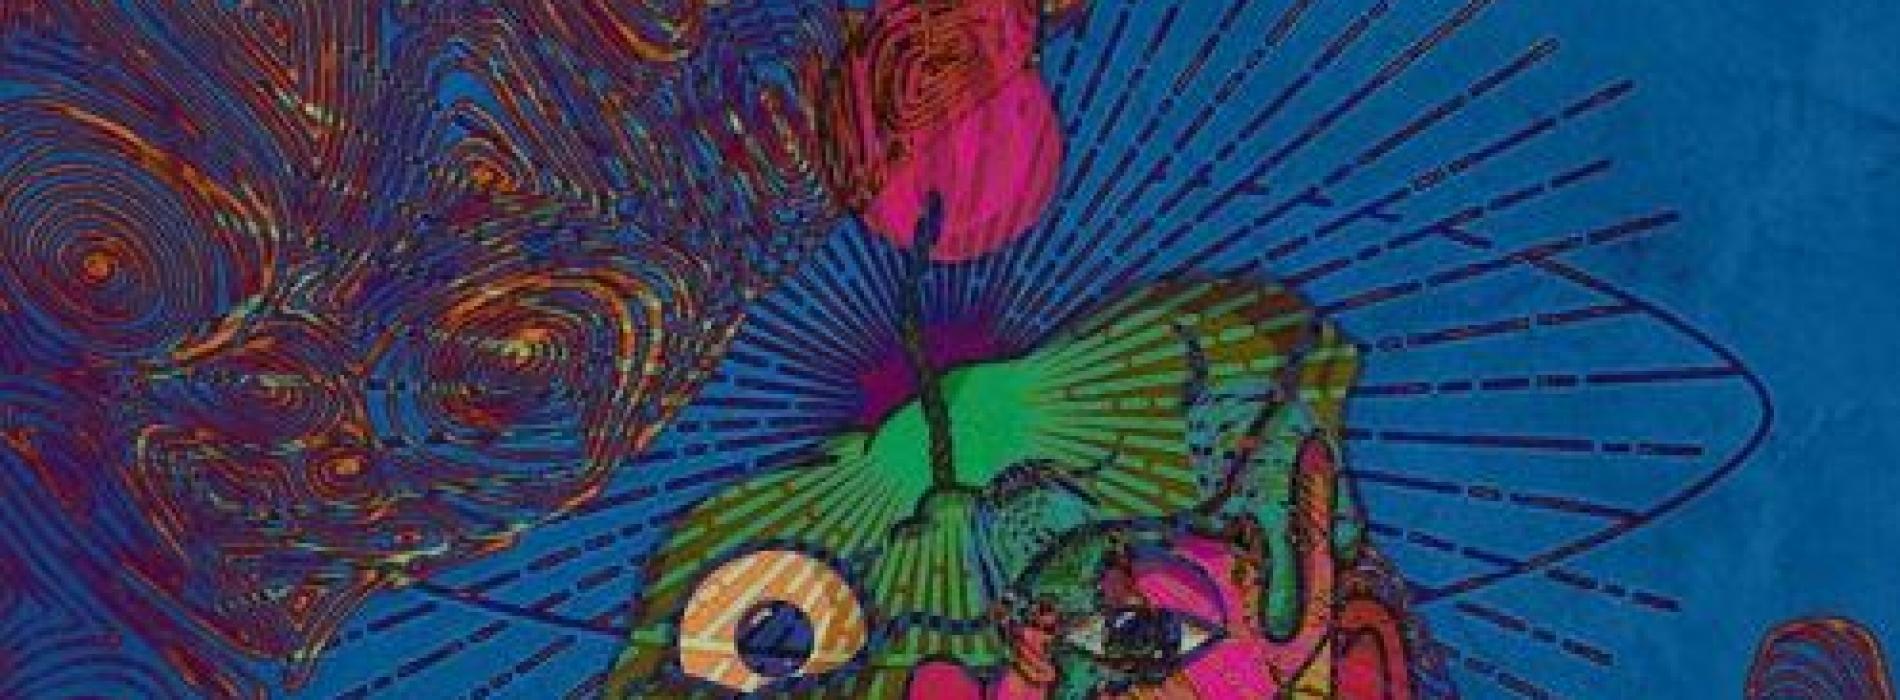 New Music : Shouse – Your Love (NETA & Dr Green Bootleg)